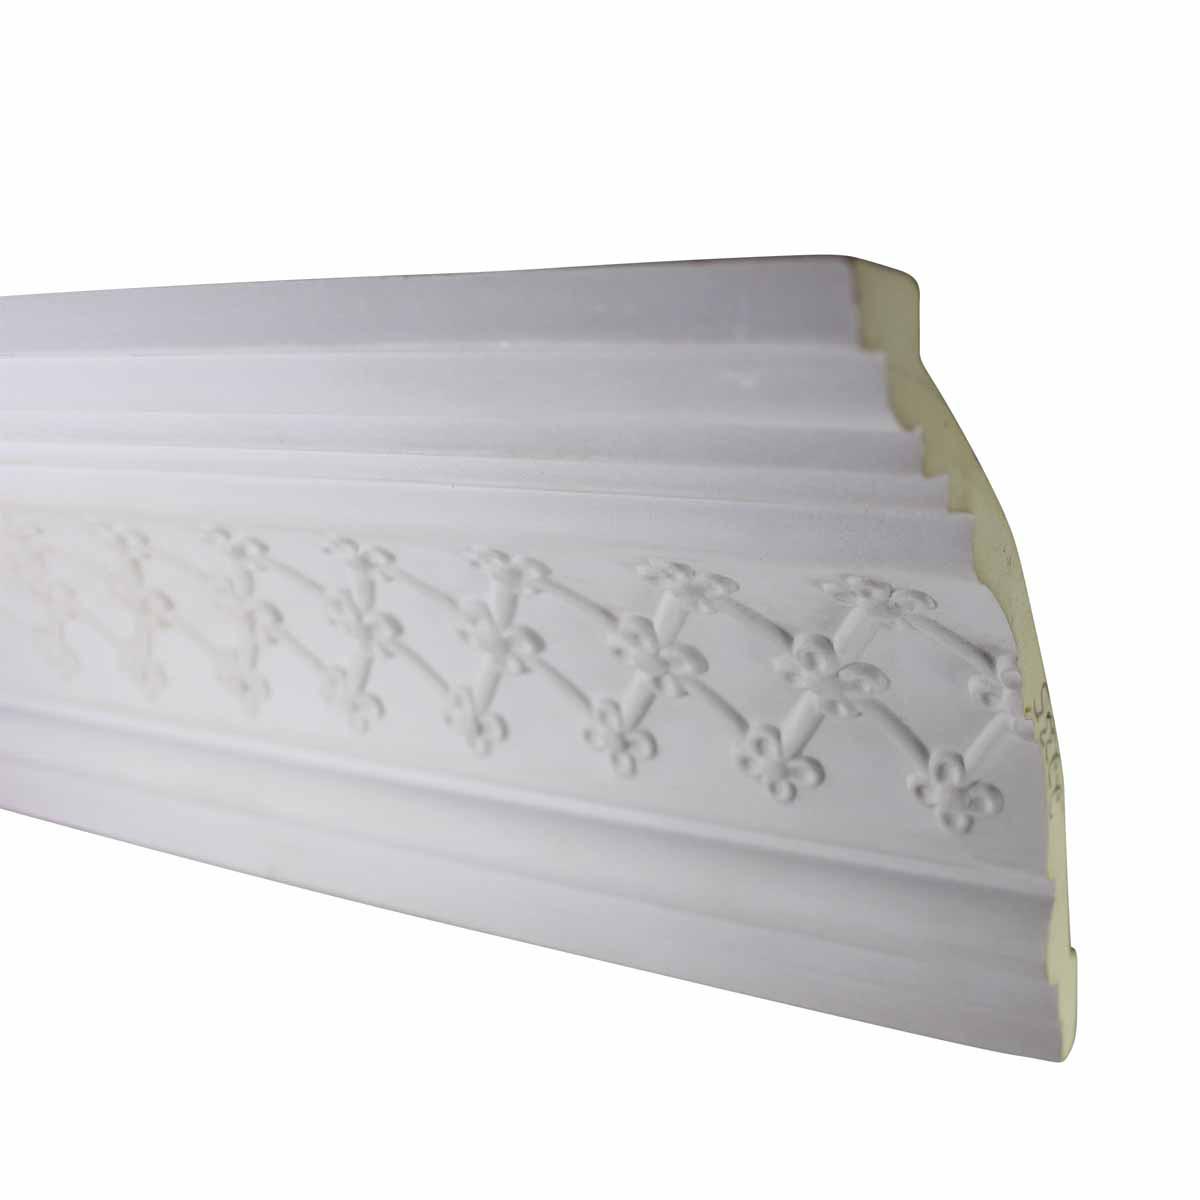 Cornice White Urethane 20 Sample of 12335 Cornice Cornice Moulding Cornice Molding